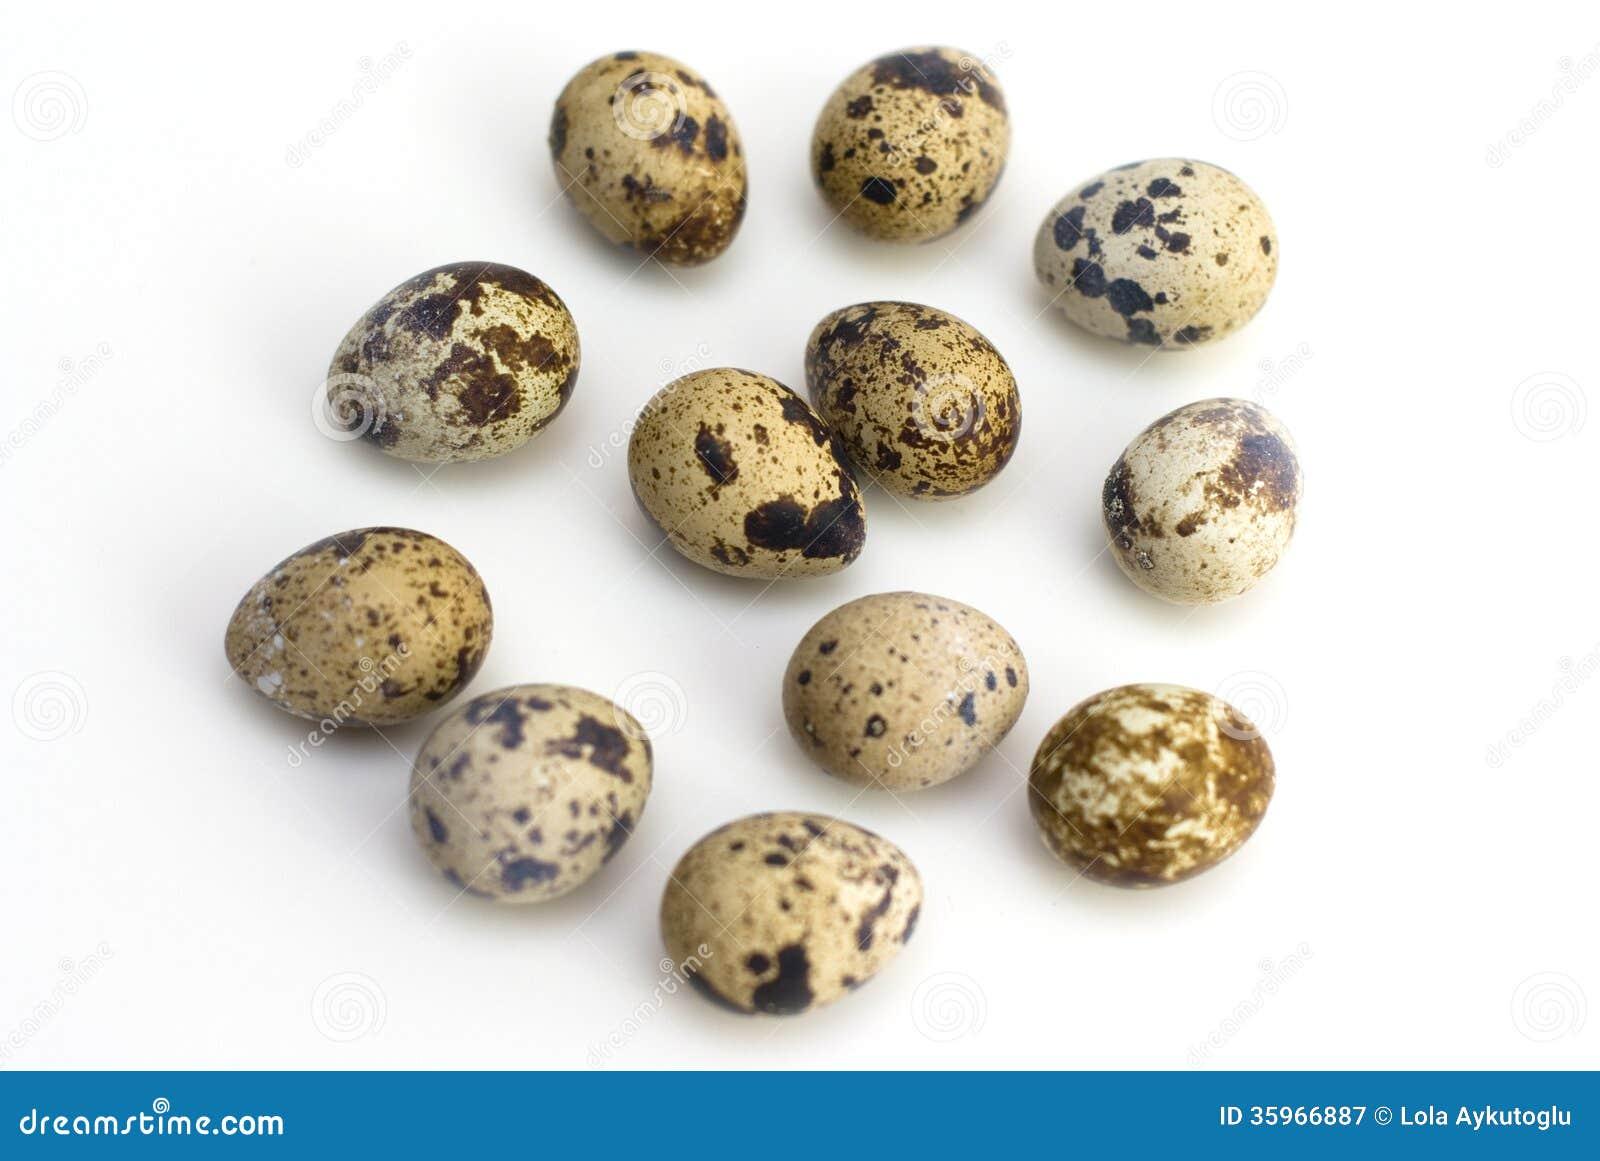 Grupo de huevos de codornices